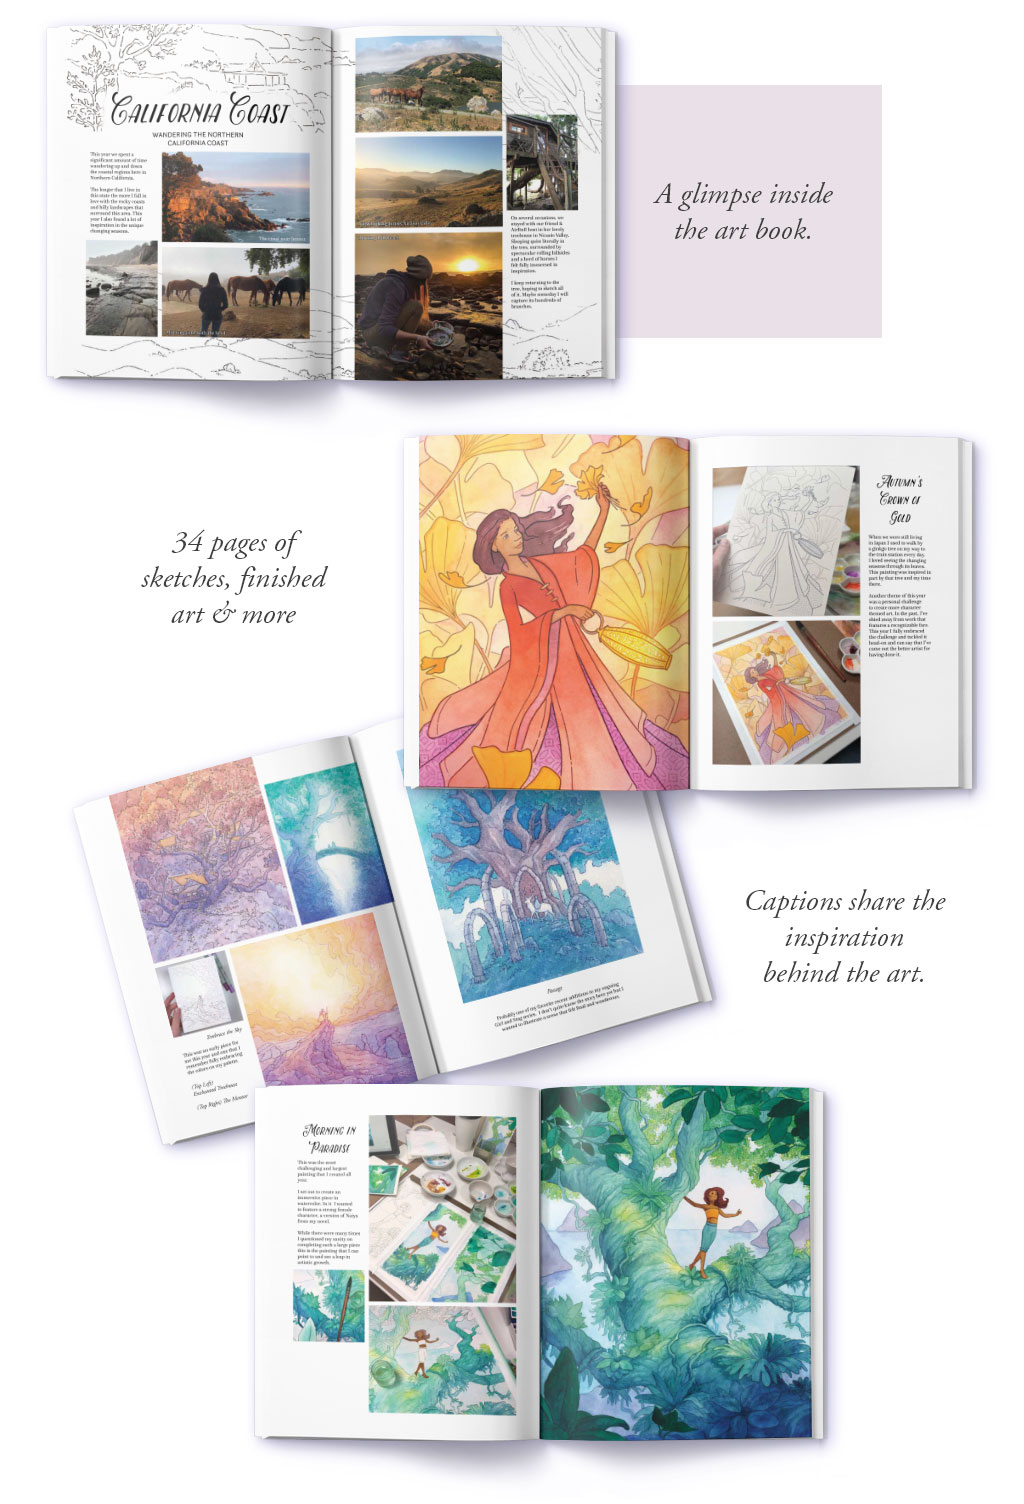 Kickstarter-Product-Images-Naomi-VanDoren-ArtBook-Interior-0.jpg